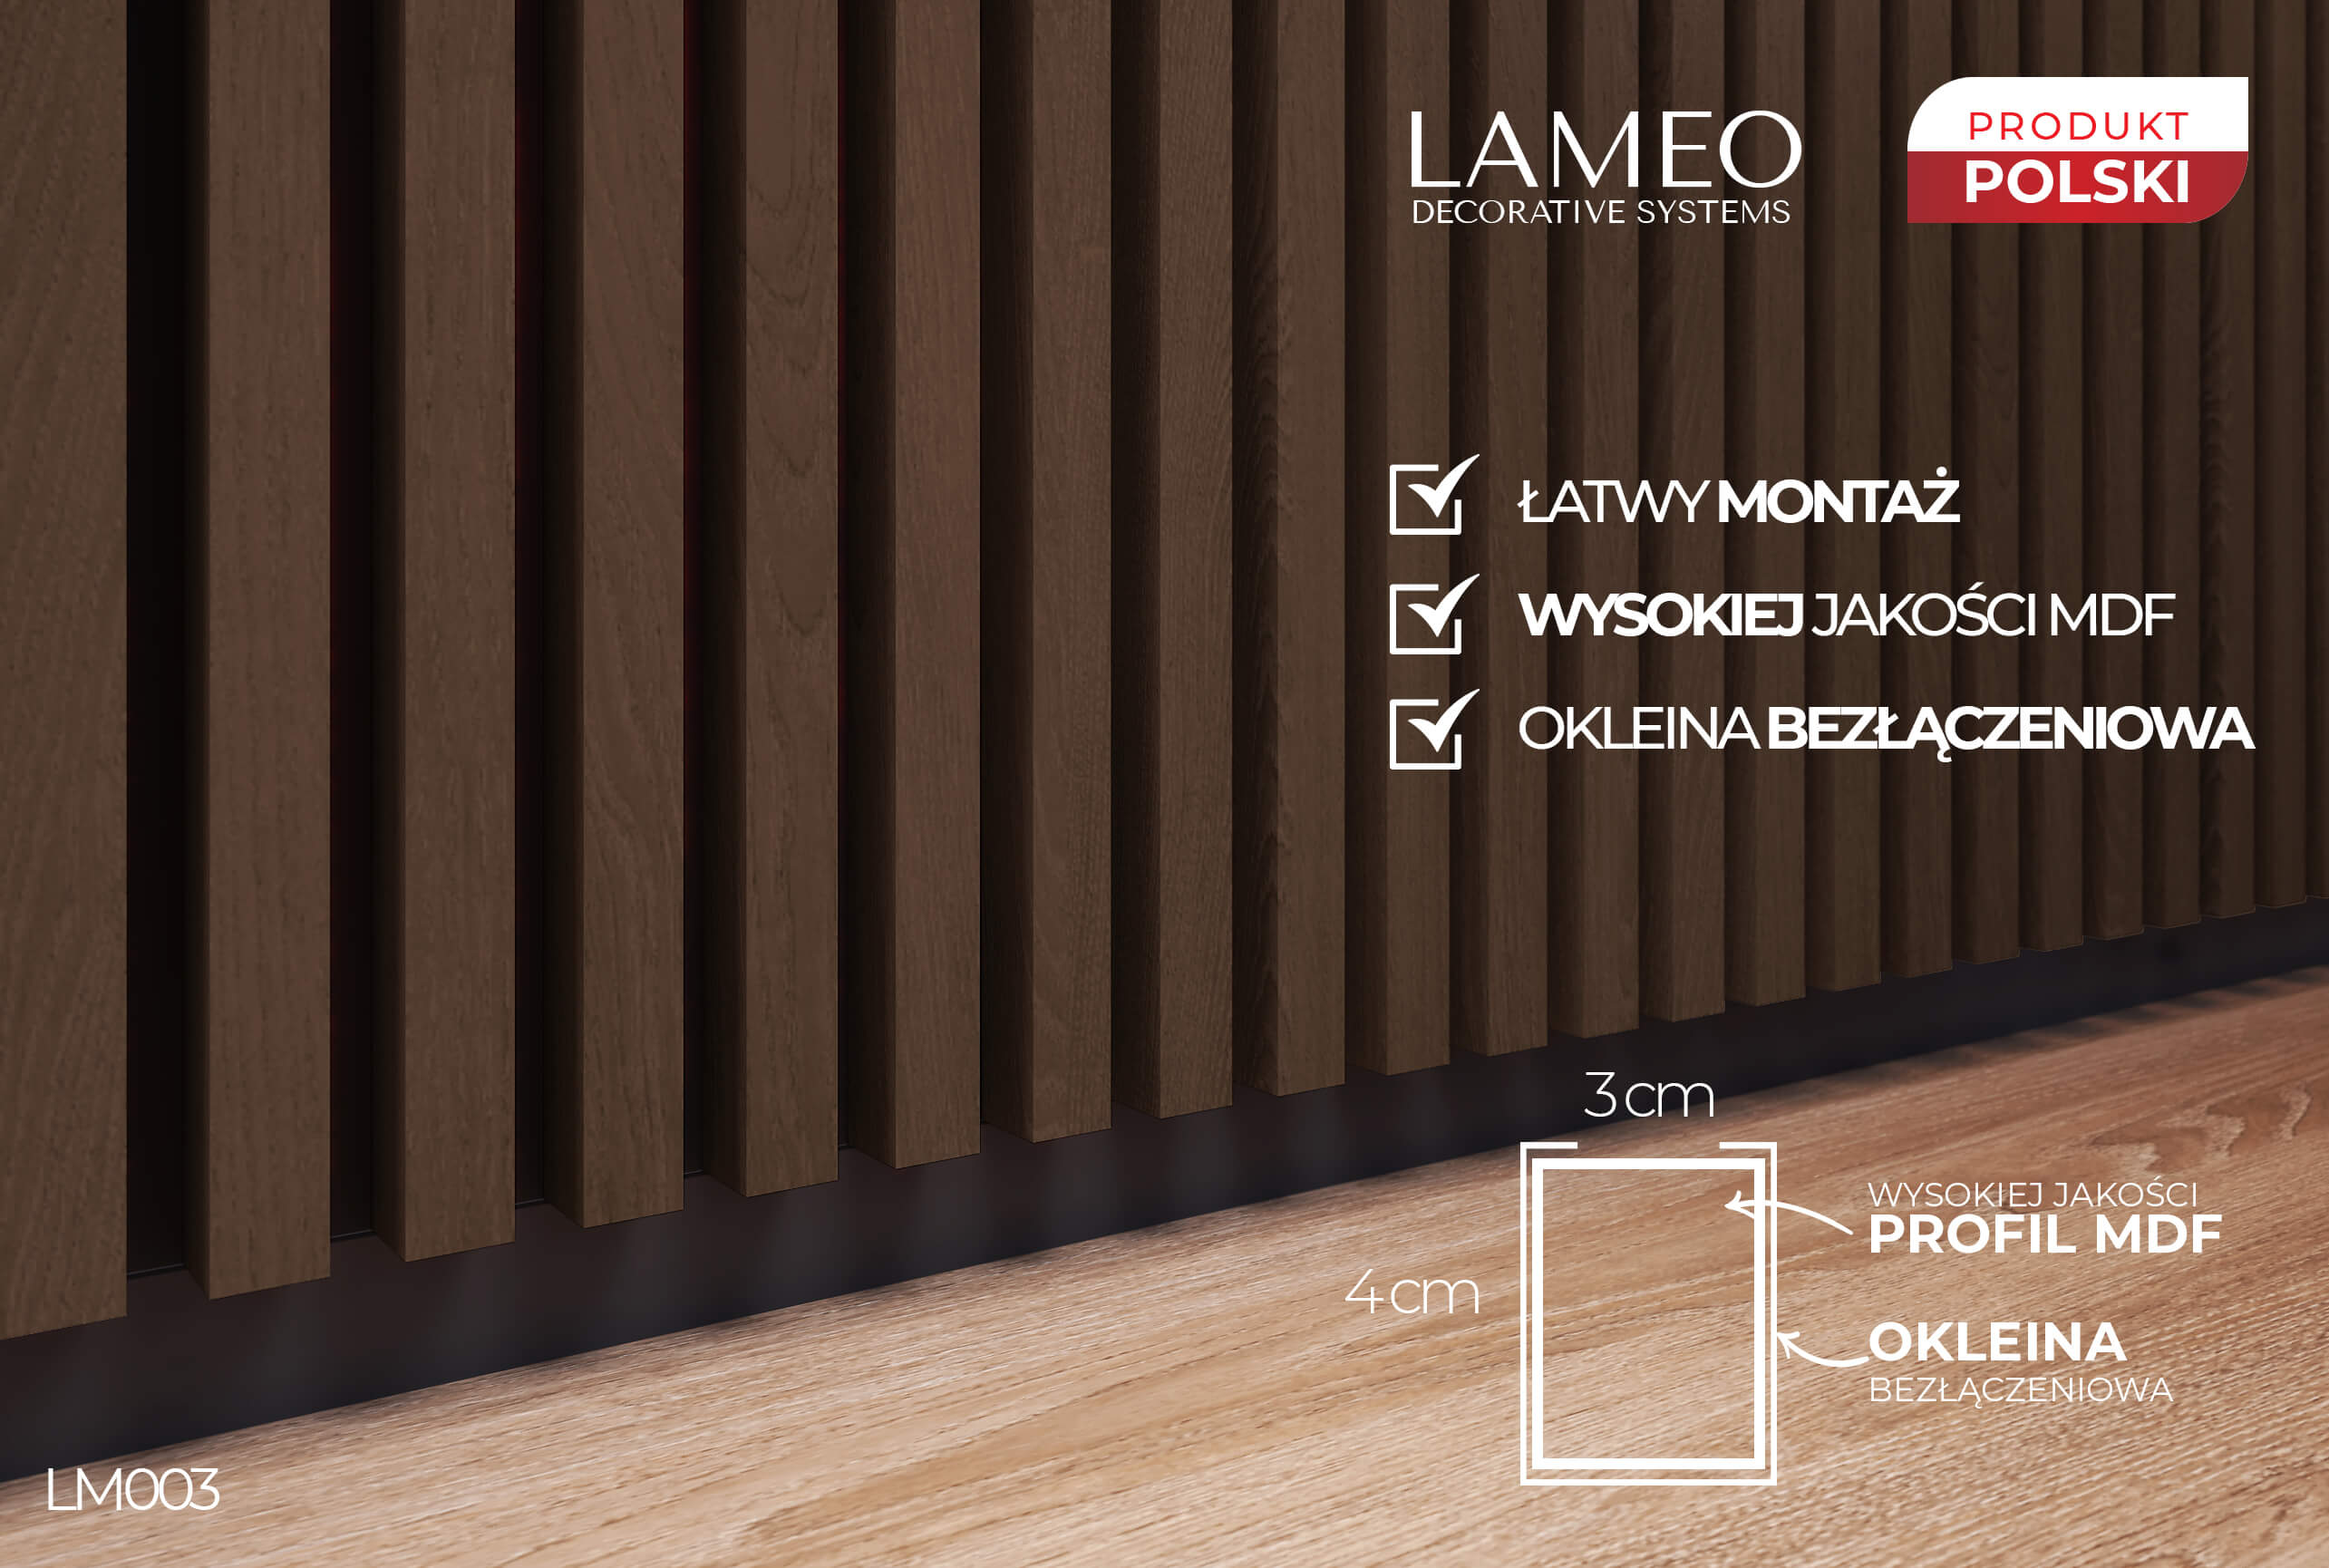 LM003_info.jpg